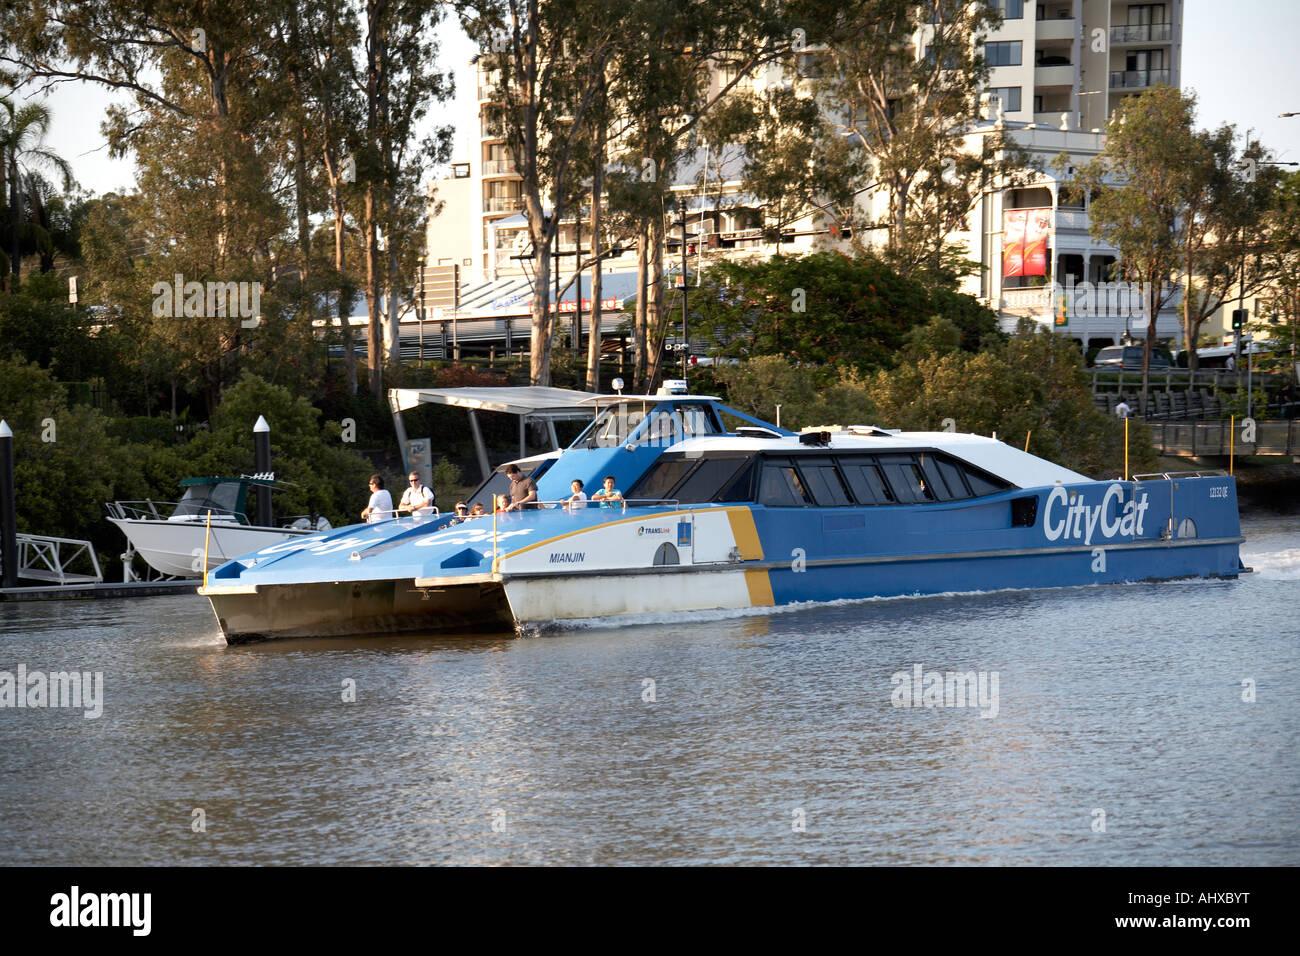 CityCat catamaran ferry on the Brisbane River in Brisbane Queensland QLD Australia - Stock Image